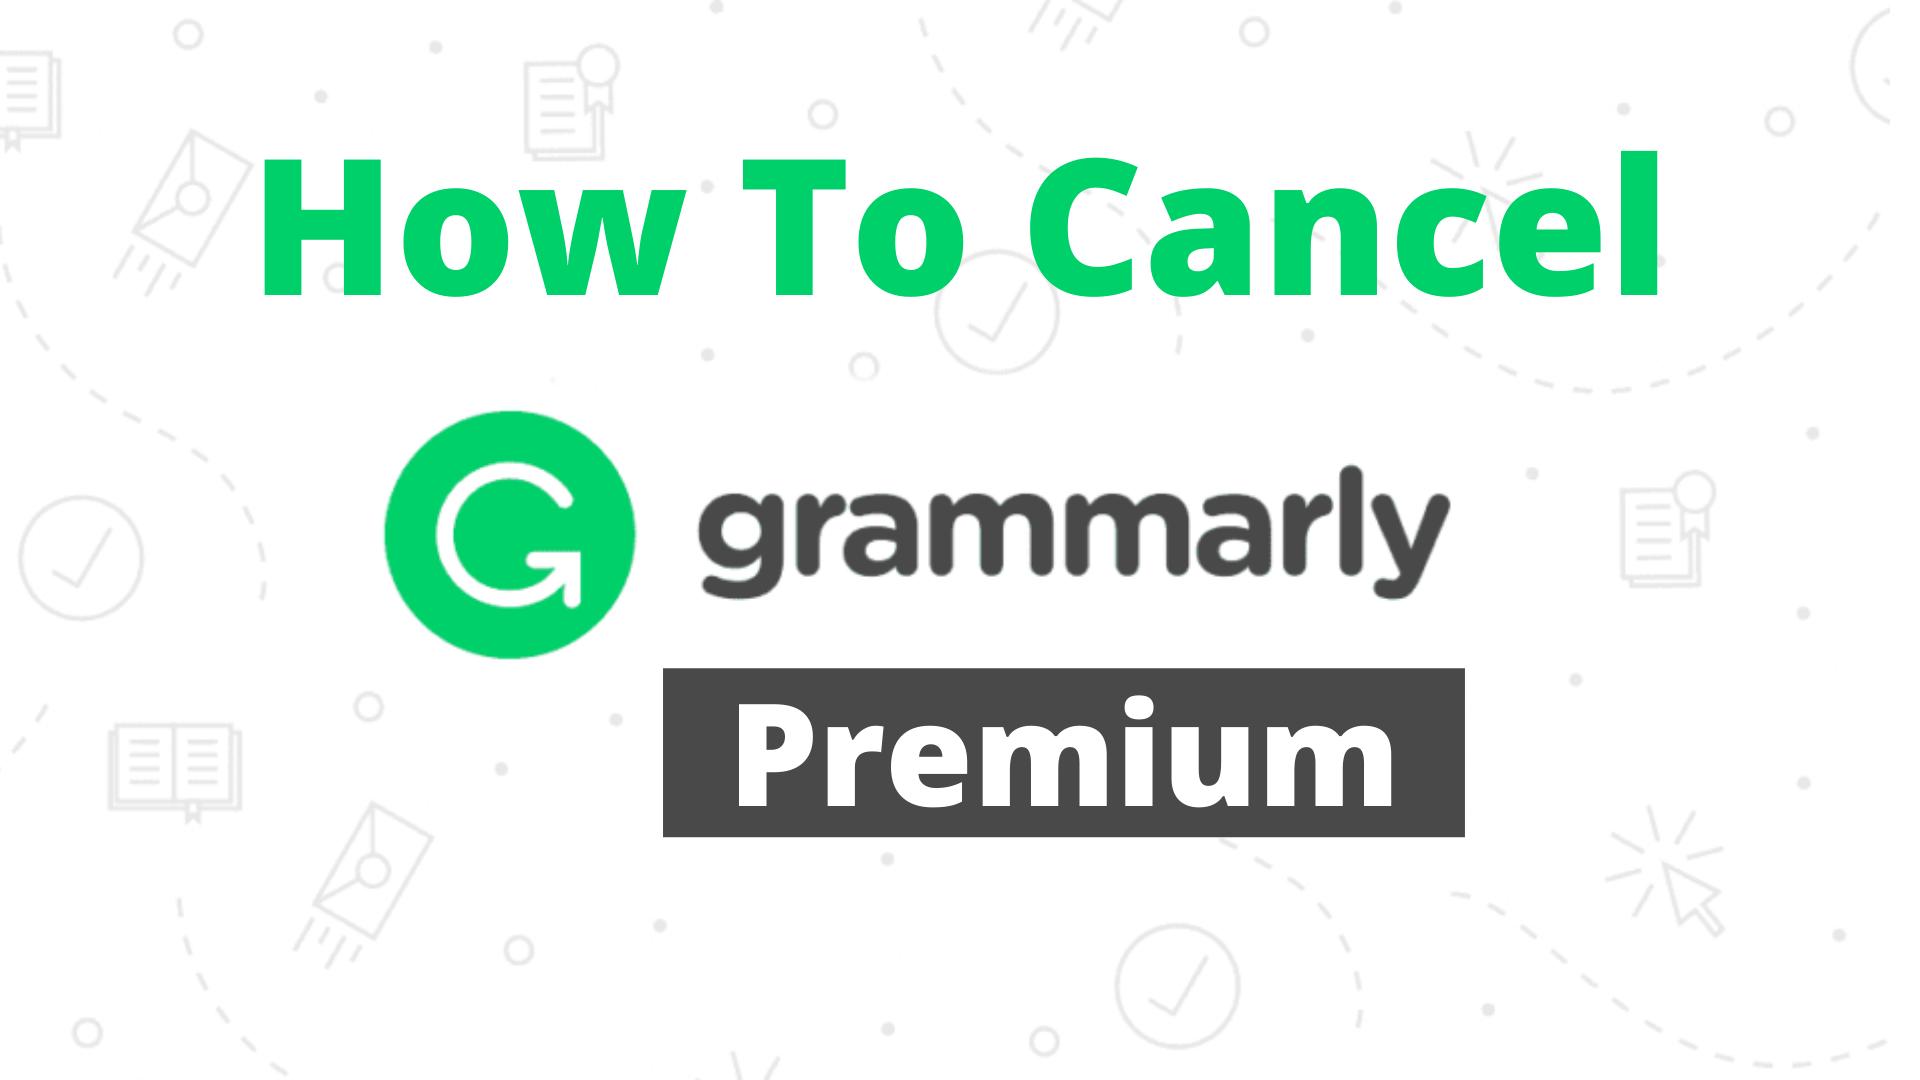 How To Cancel Grammarly Premium